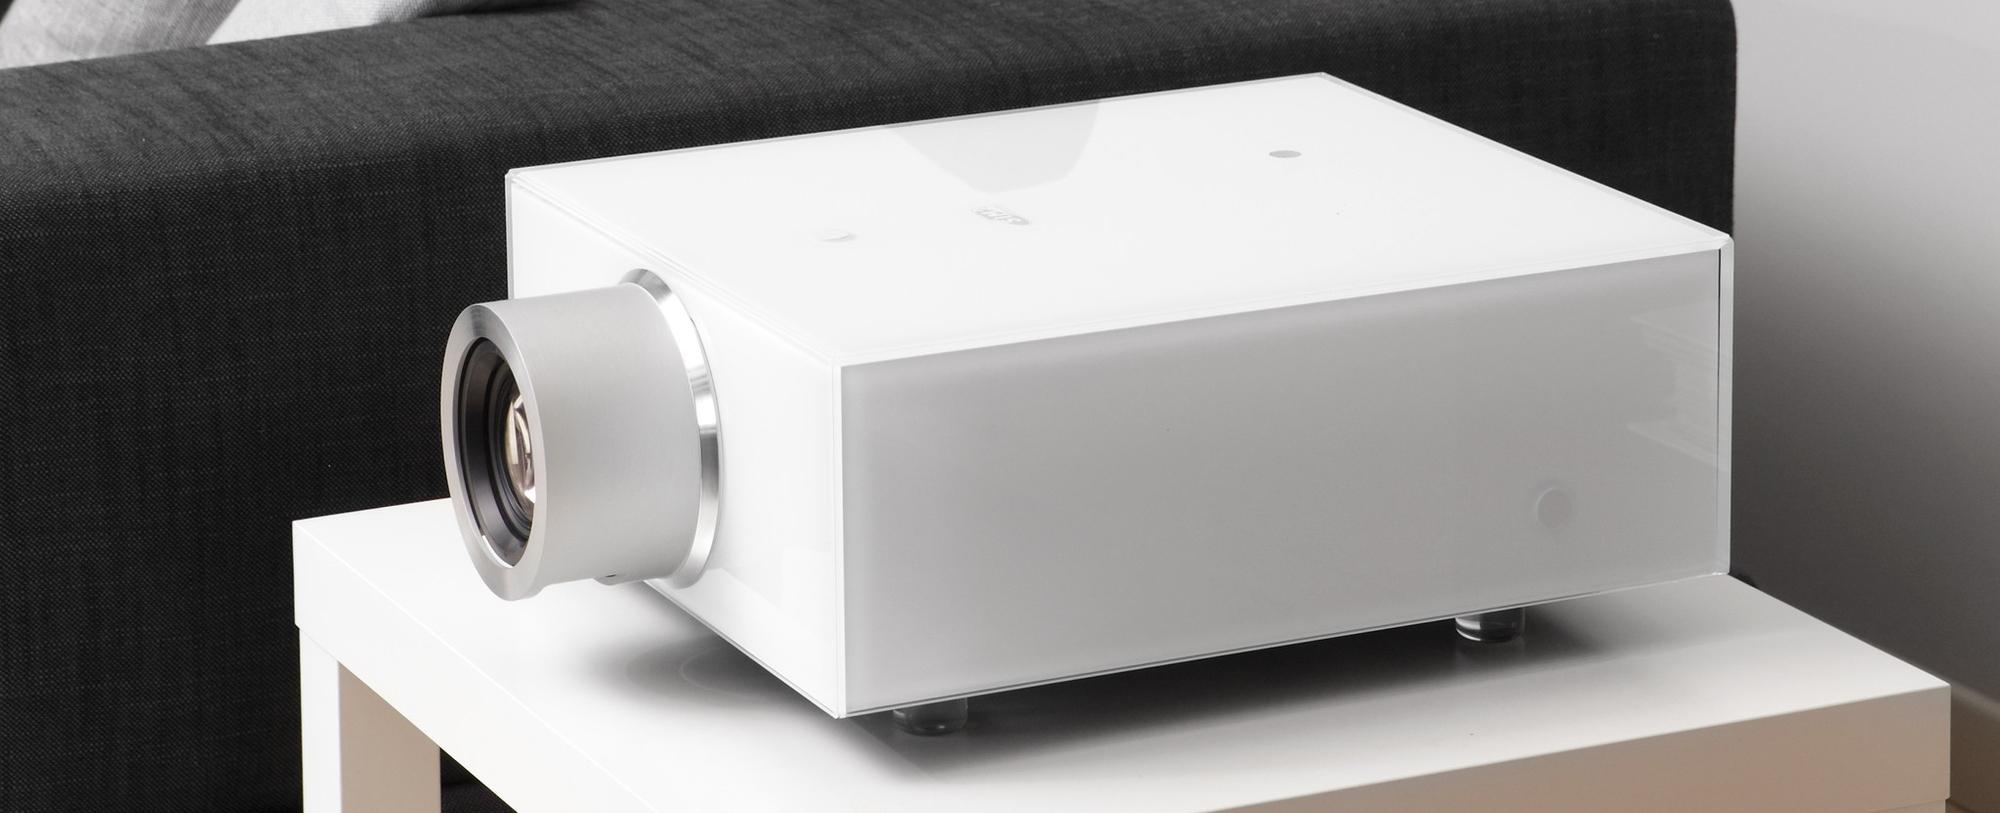 SIM2 Nero 3 Projector